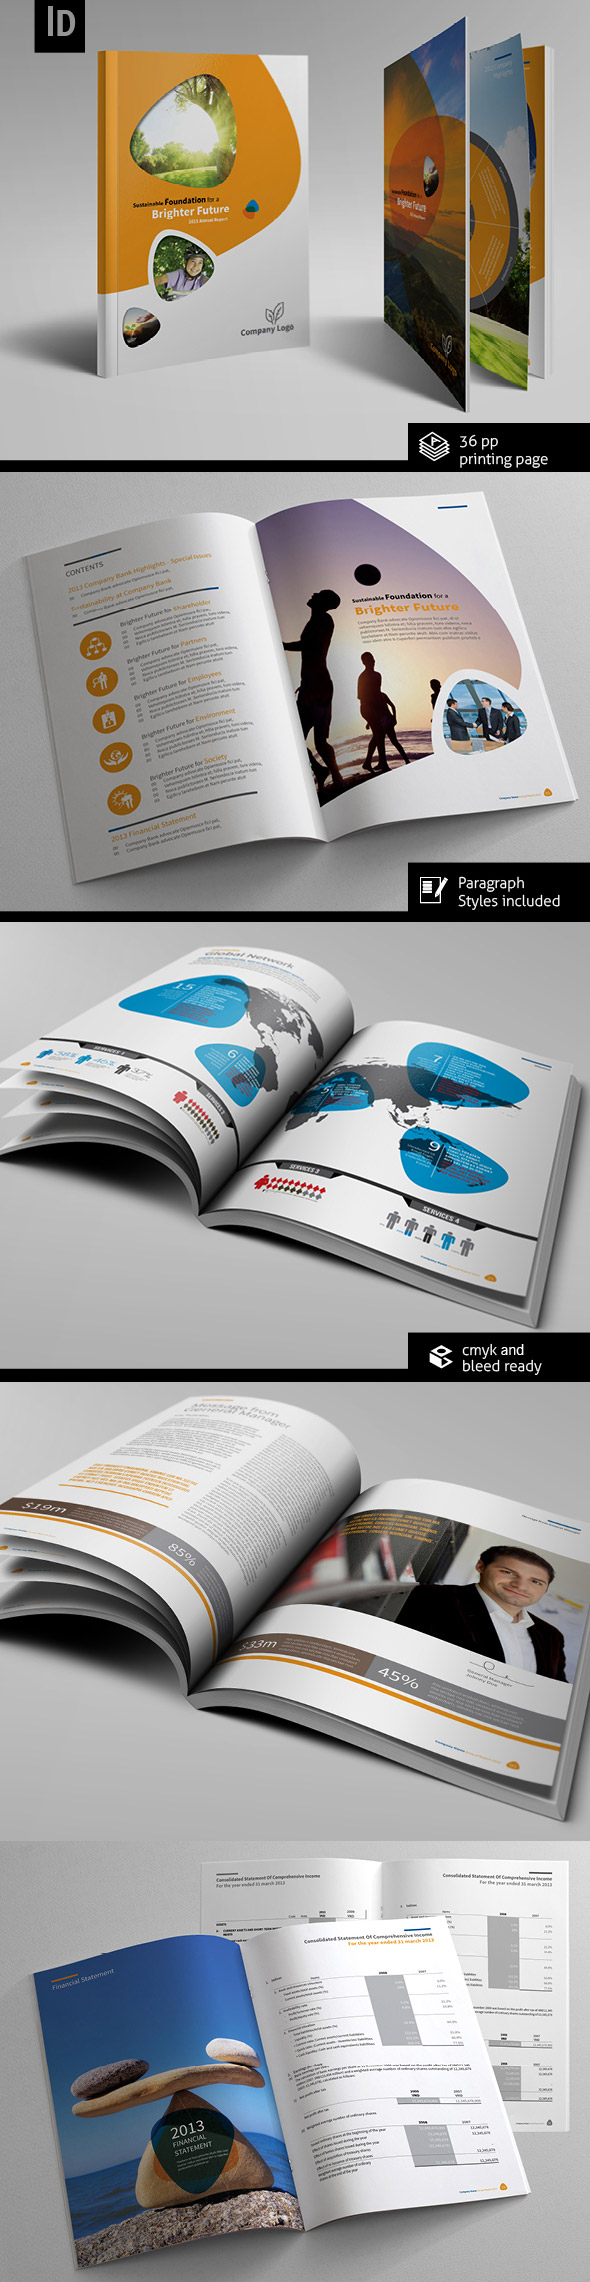 annual report design brochure